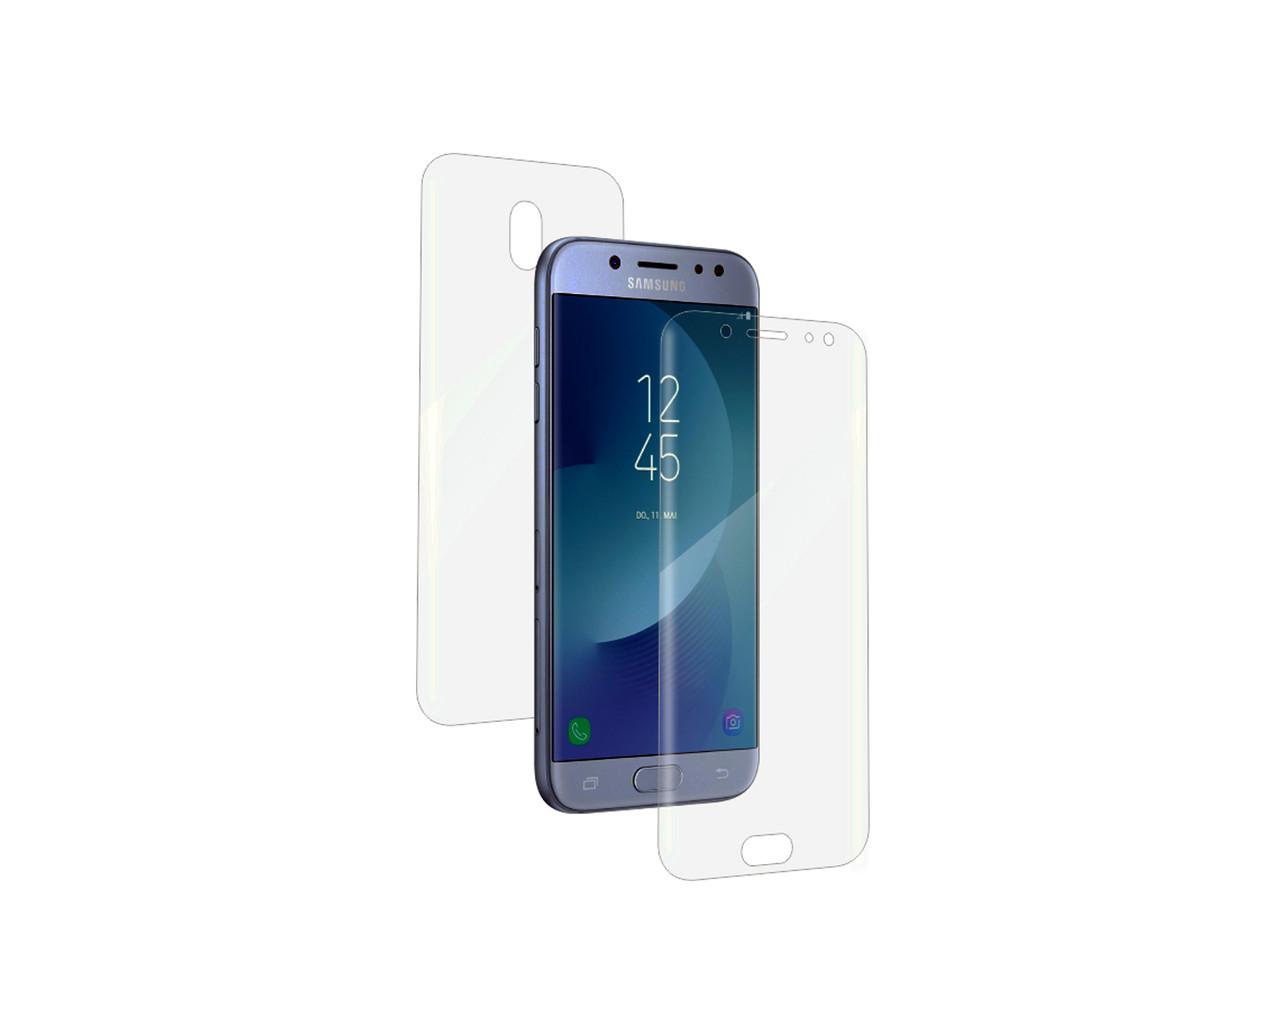 Захисна плівка Nano ITOP 360 для Samsung Galaxy J3 2017 Full Cover